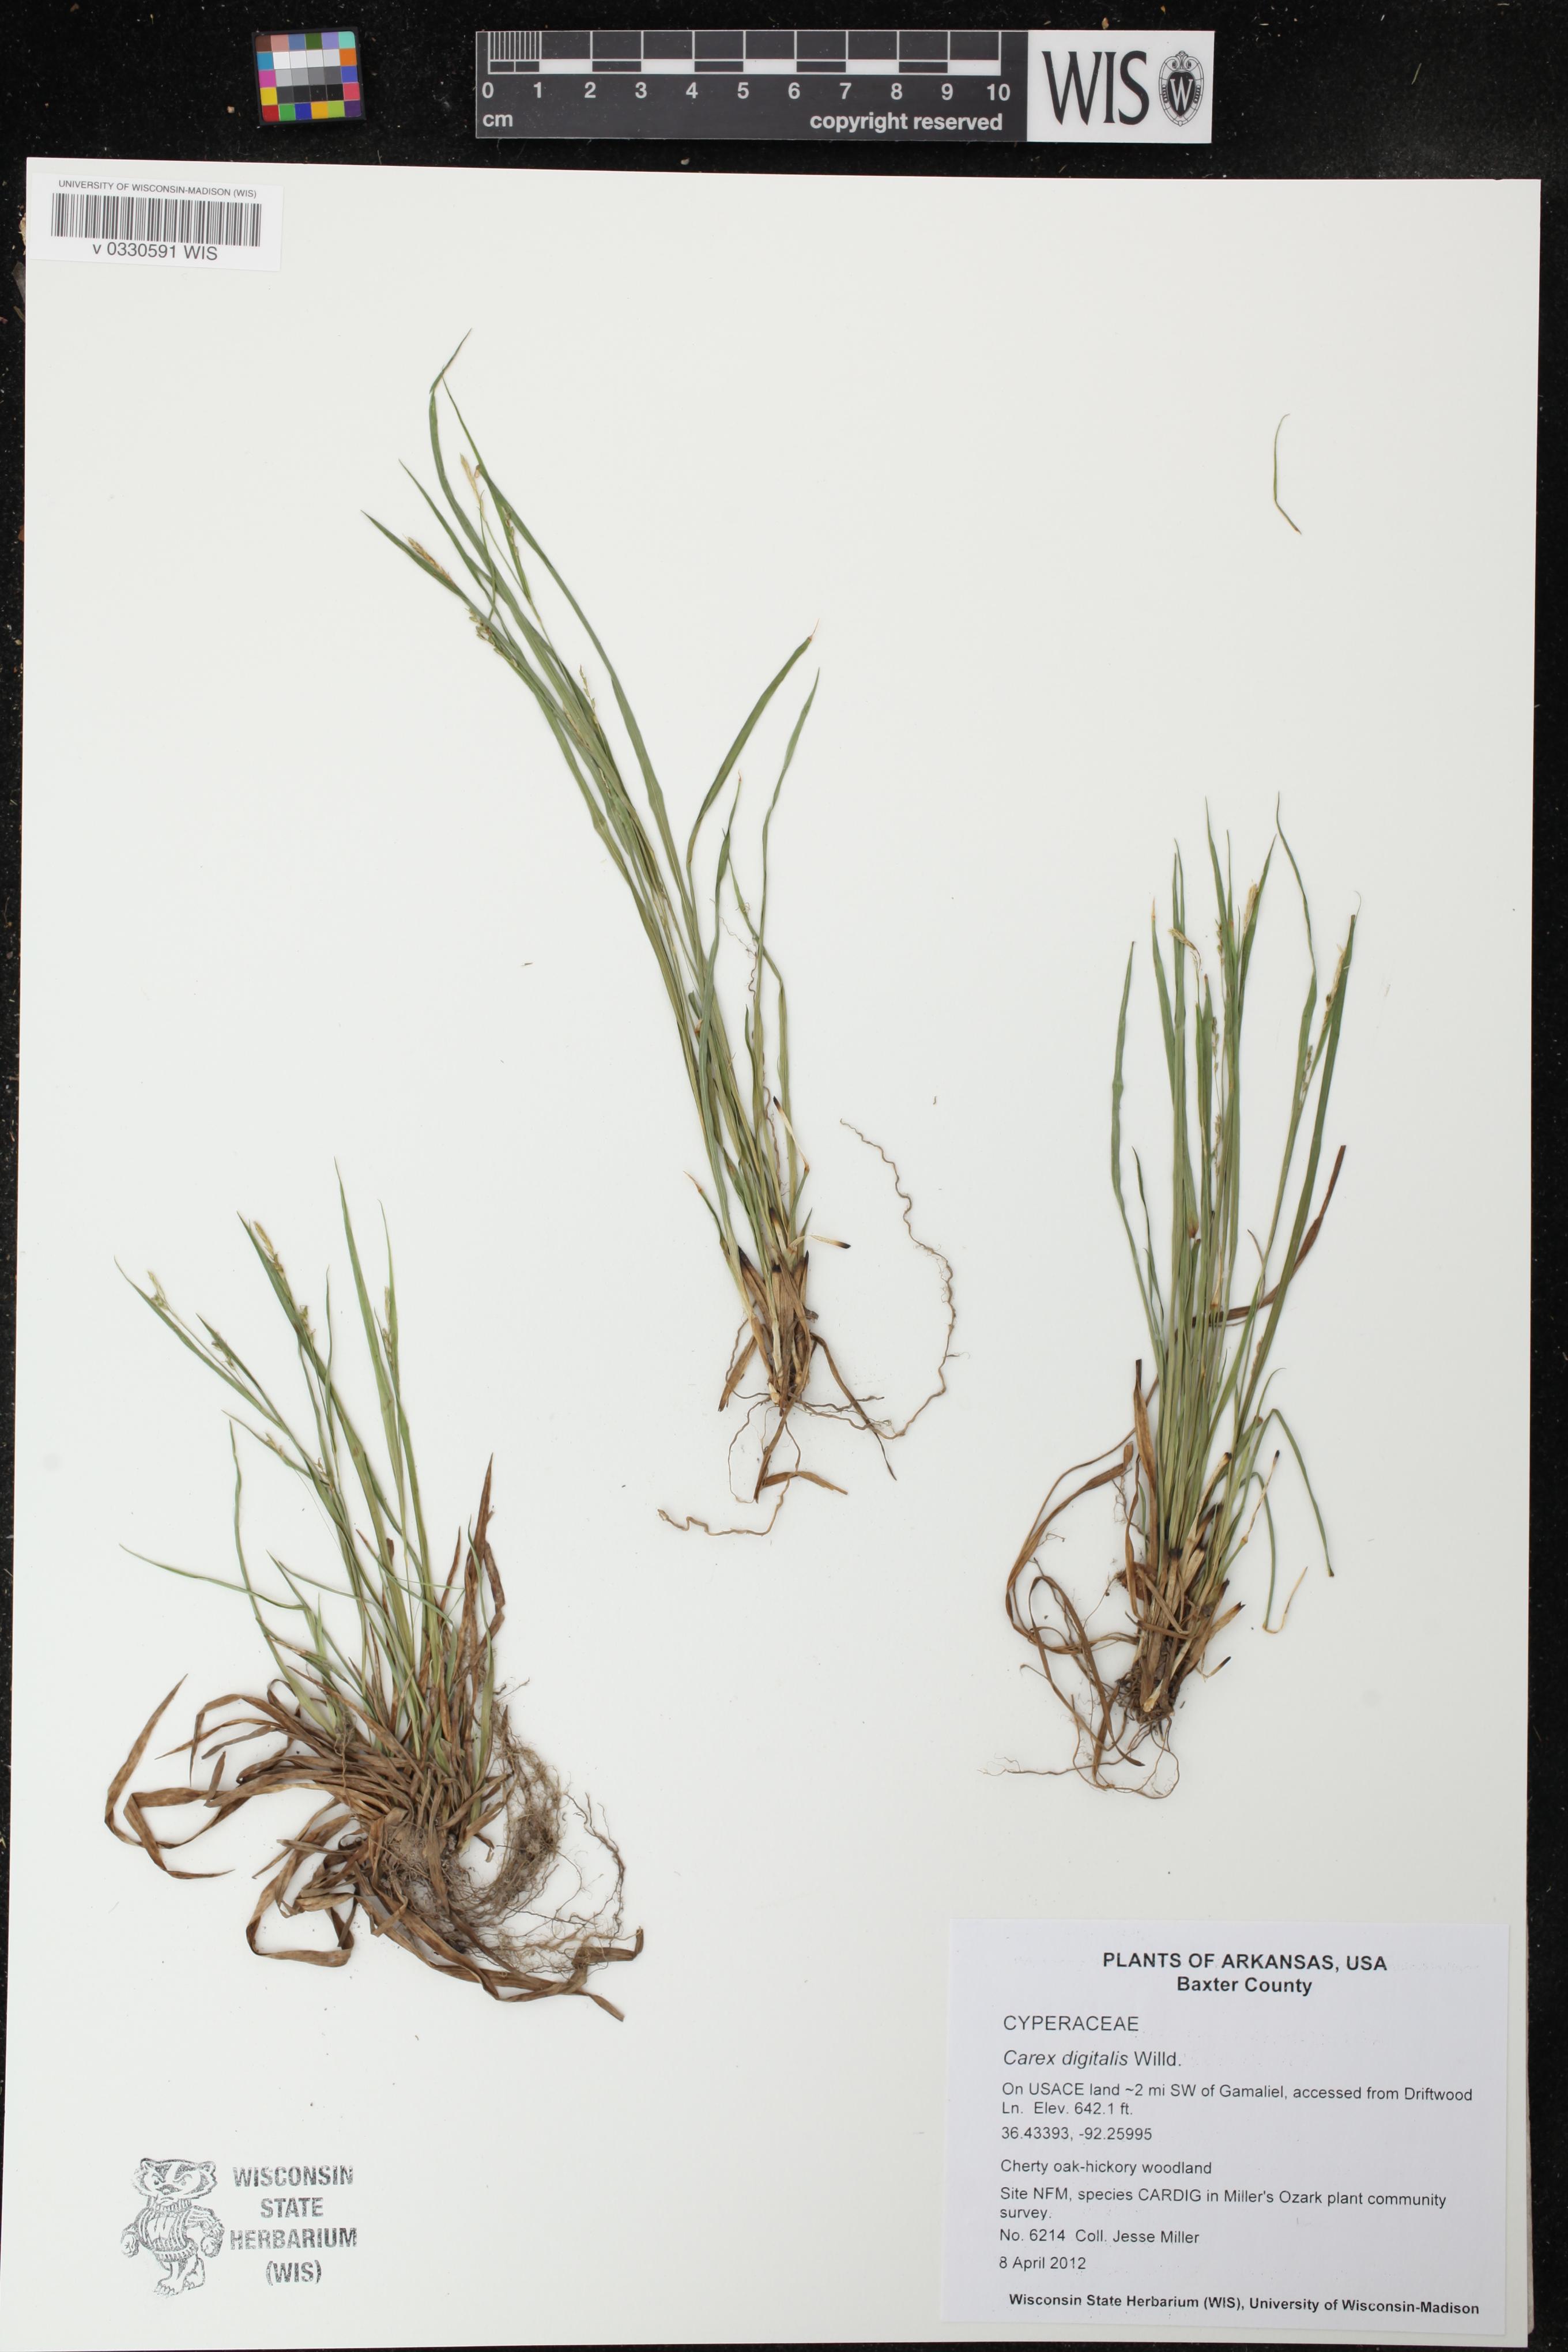 Image of Carex digitalis